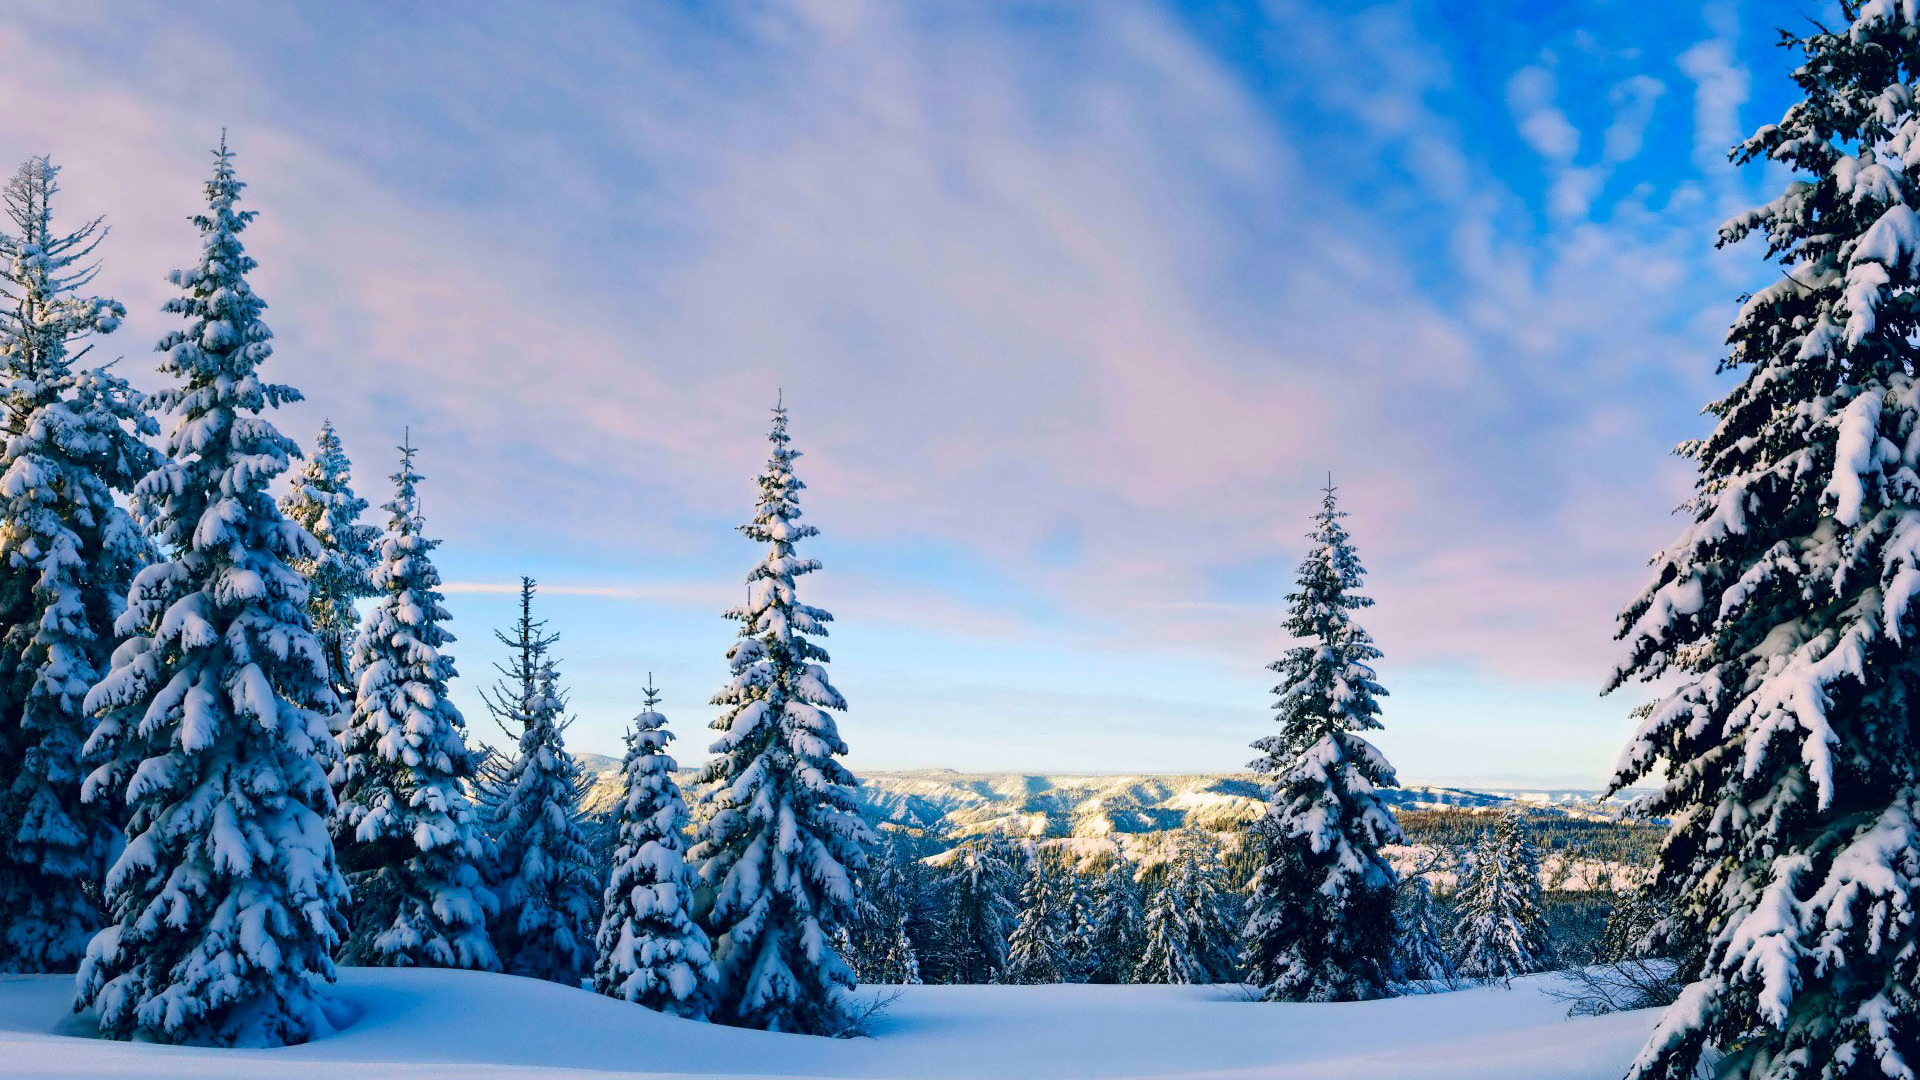 природа лес деревья ели гора облака небо  № 2757534 бесплатно